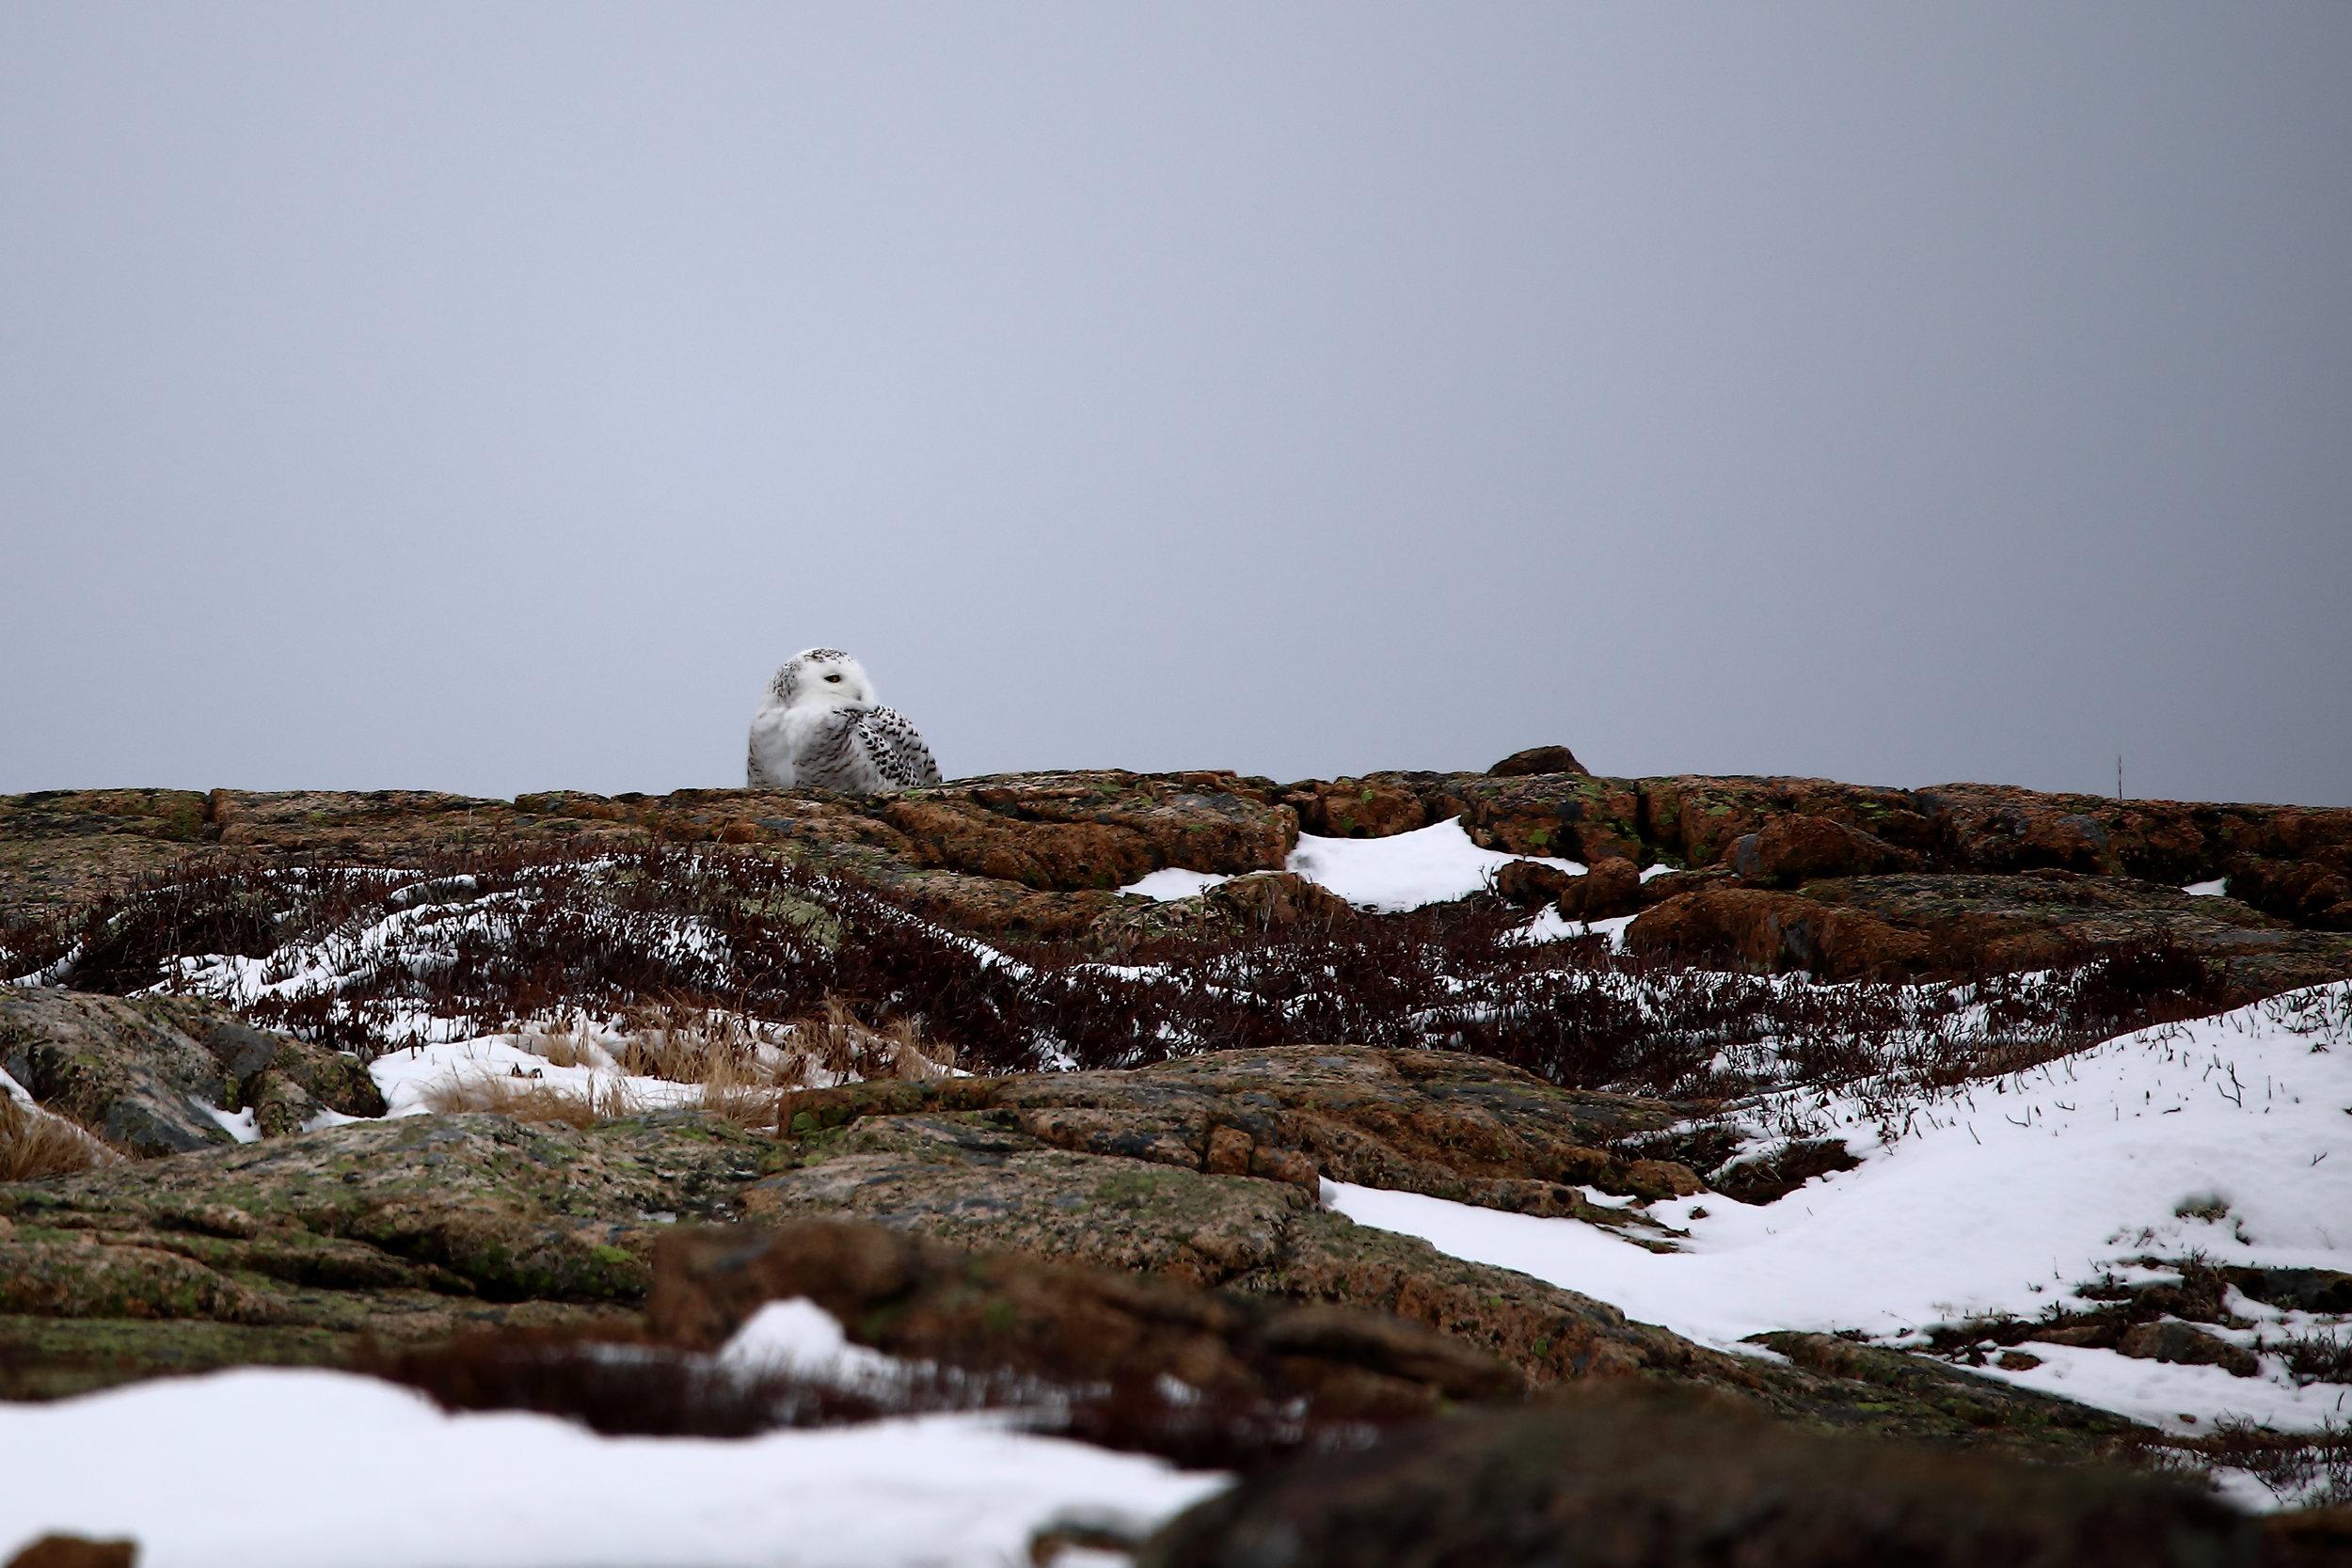 Snowy owl on Sargent Mountain.